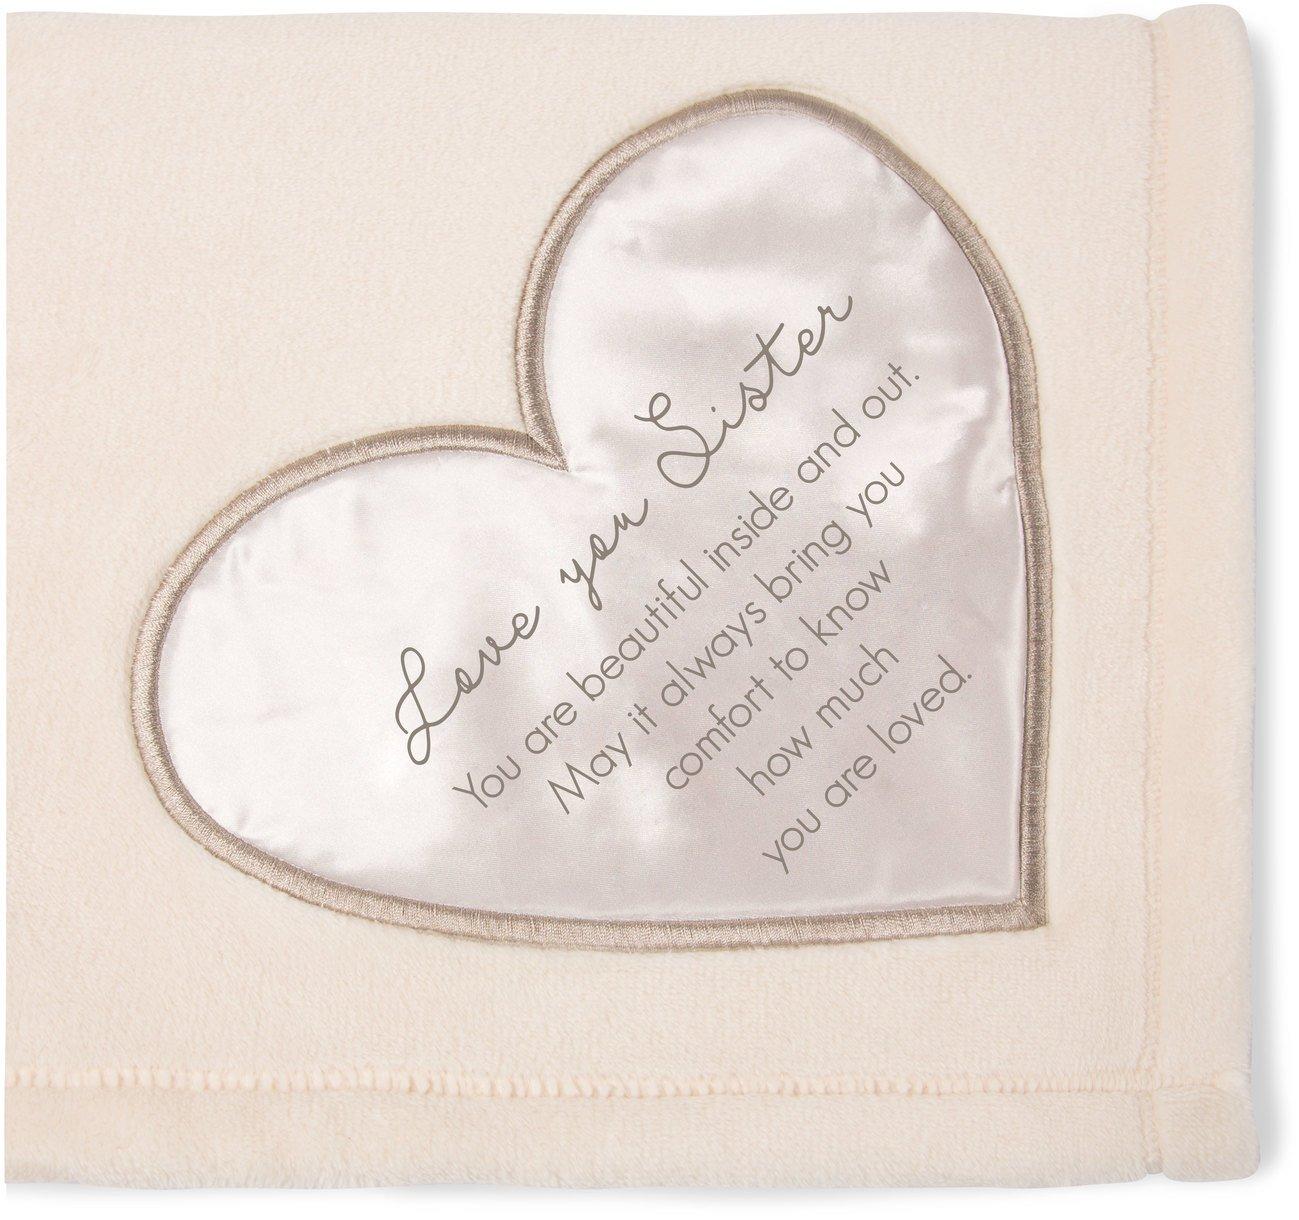 Pavilion Gift Company 19504 Comfort Blanket - Love You Sister Thick Warm 320 Gsm Royal Plush Throw Blanket